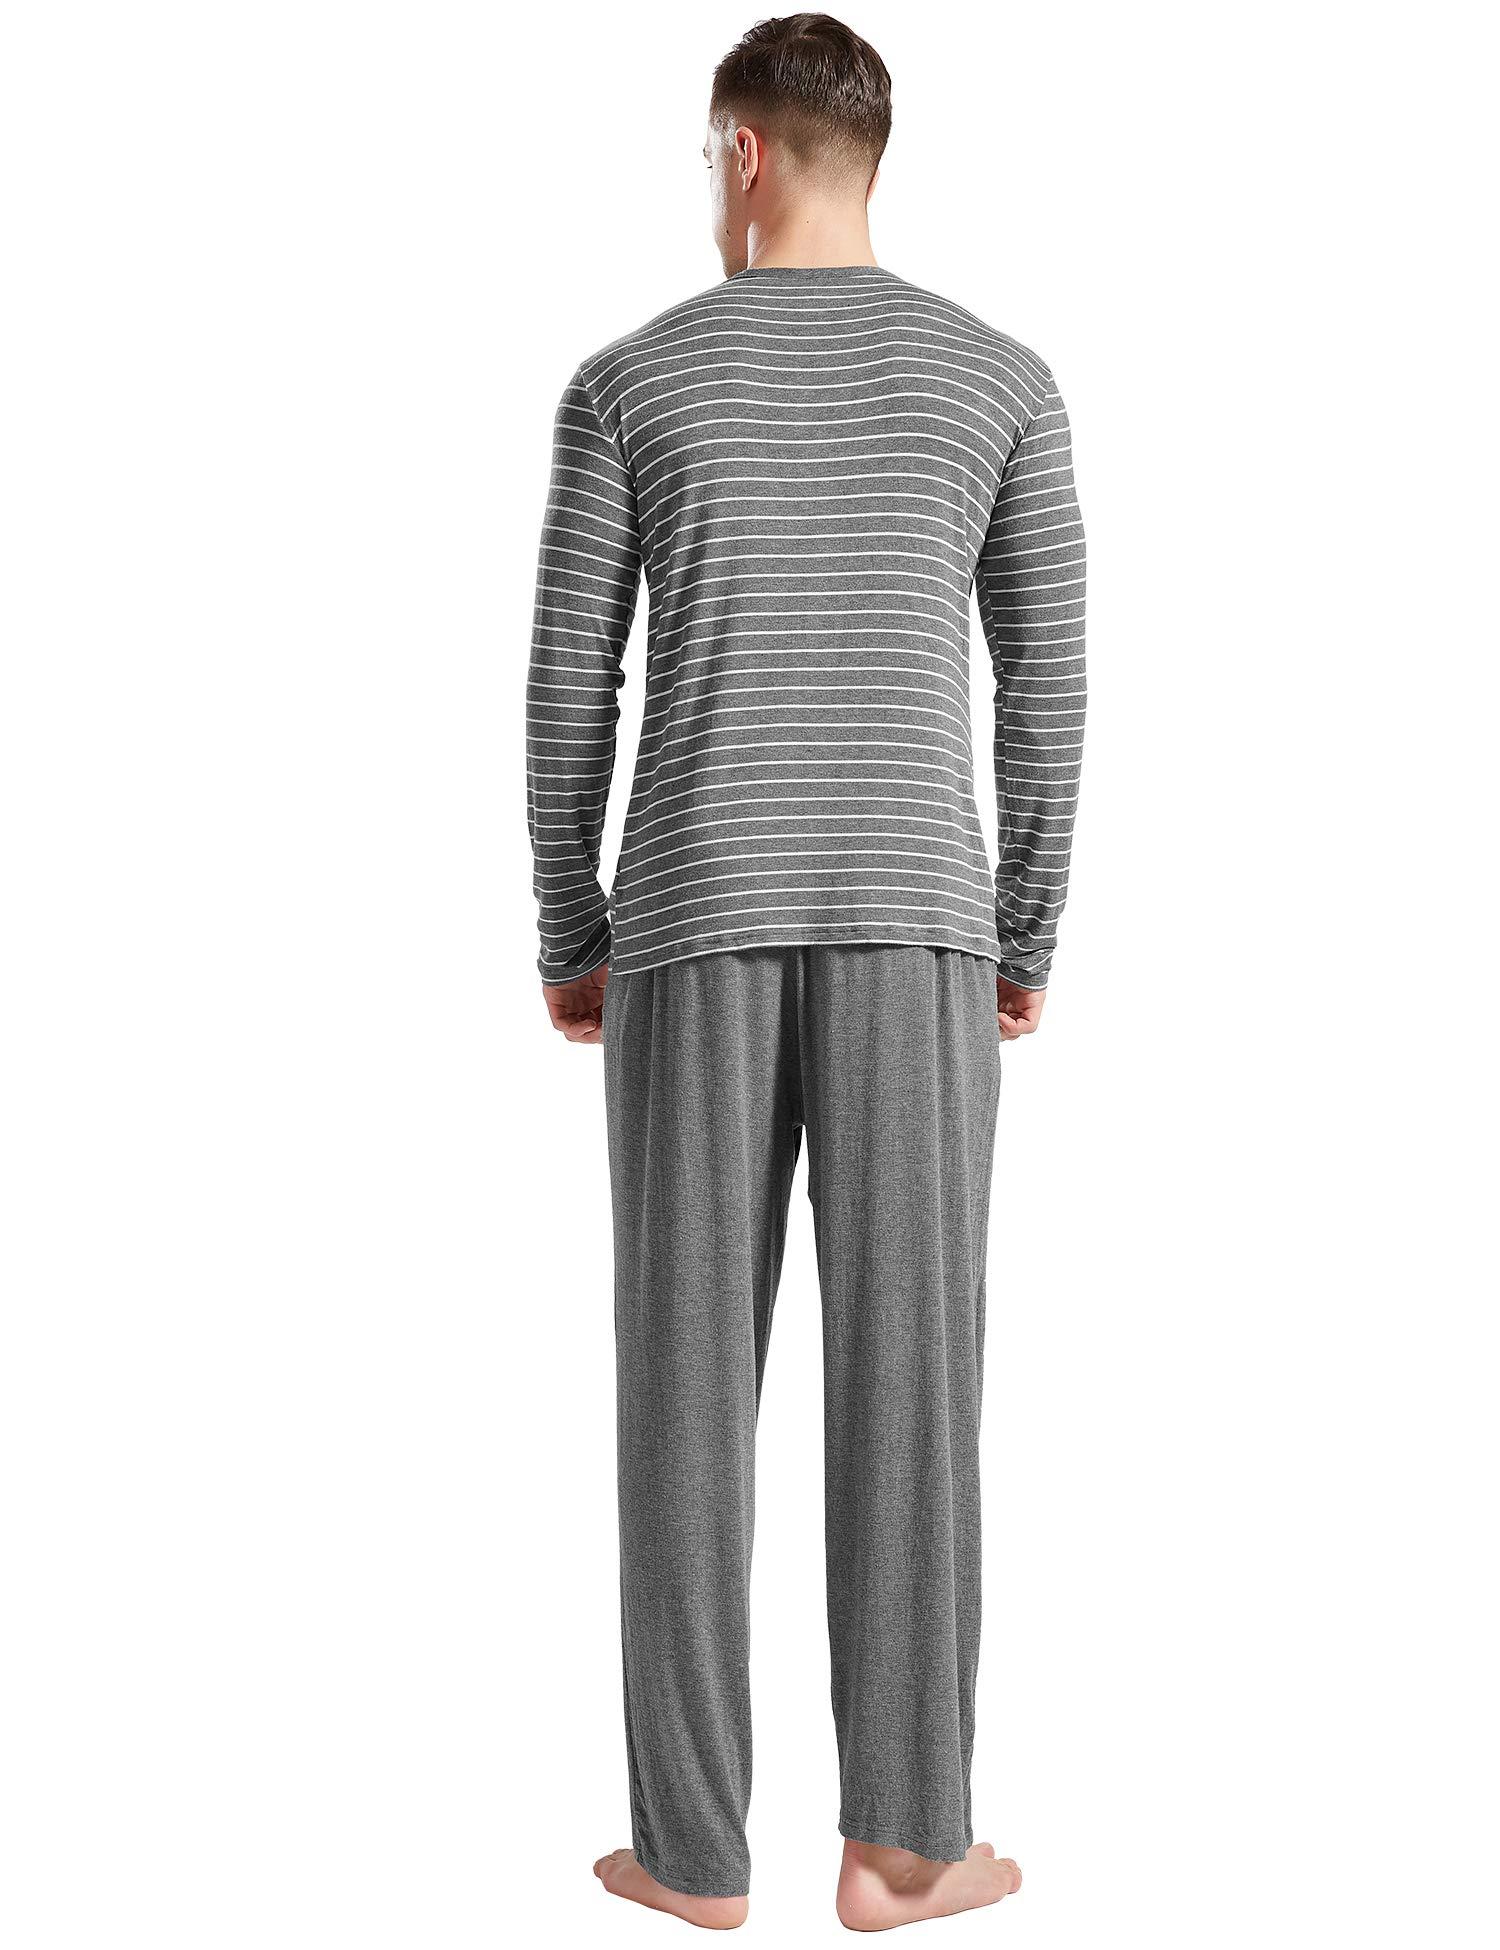 LEMONMOON Men\'s Pajama Set Cotton Classic Striped Crew Neck Sleepwear 2 Piece Long Sleeve Tee with Long Pants, Gray S